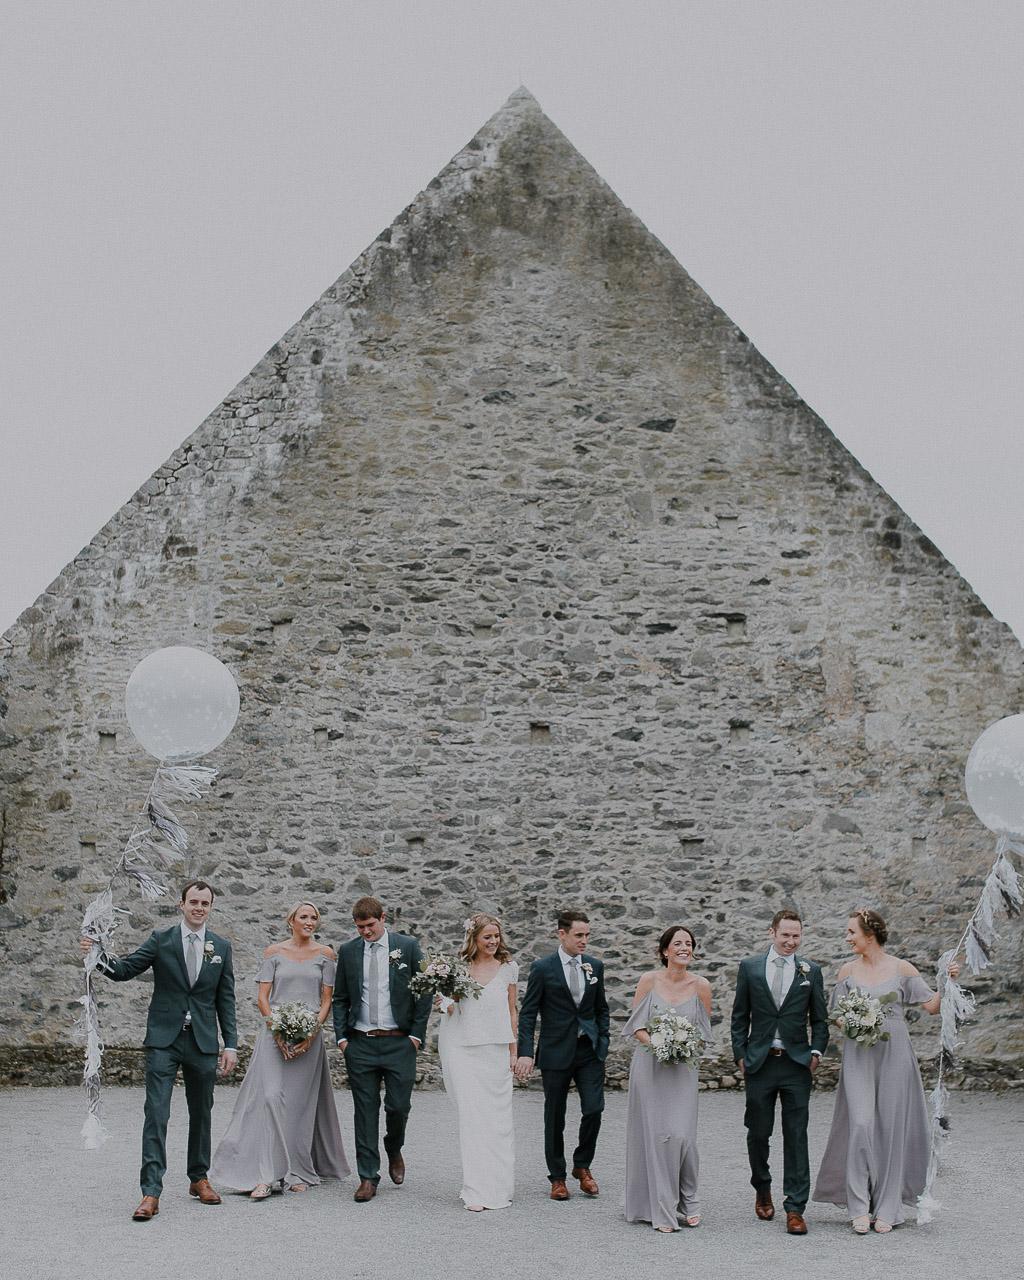 documentary-wedding-alternative-photographer-ireland-katie-farrell-cool-wedding-photographer-ireland-katie-farrell-photography-400